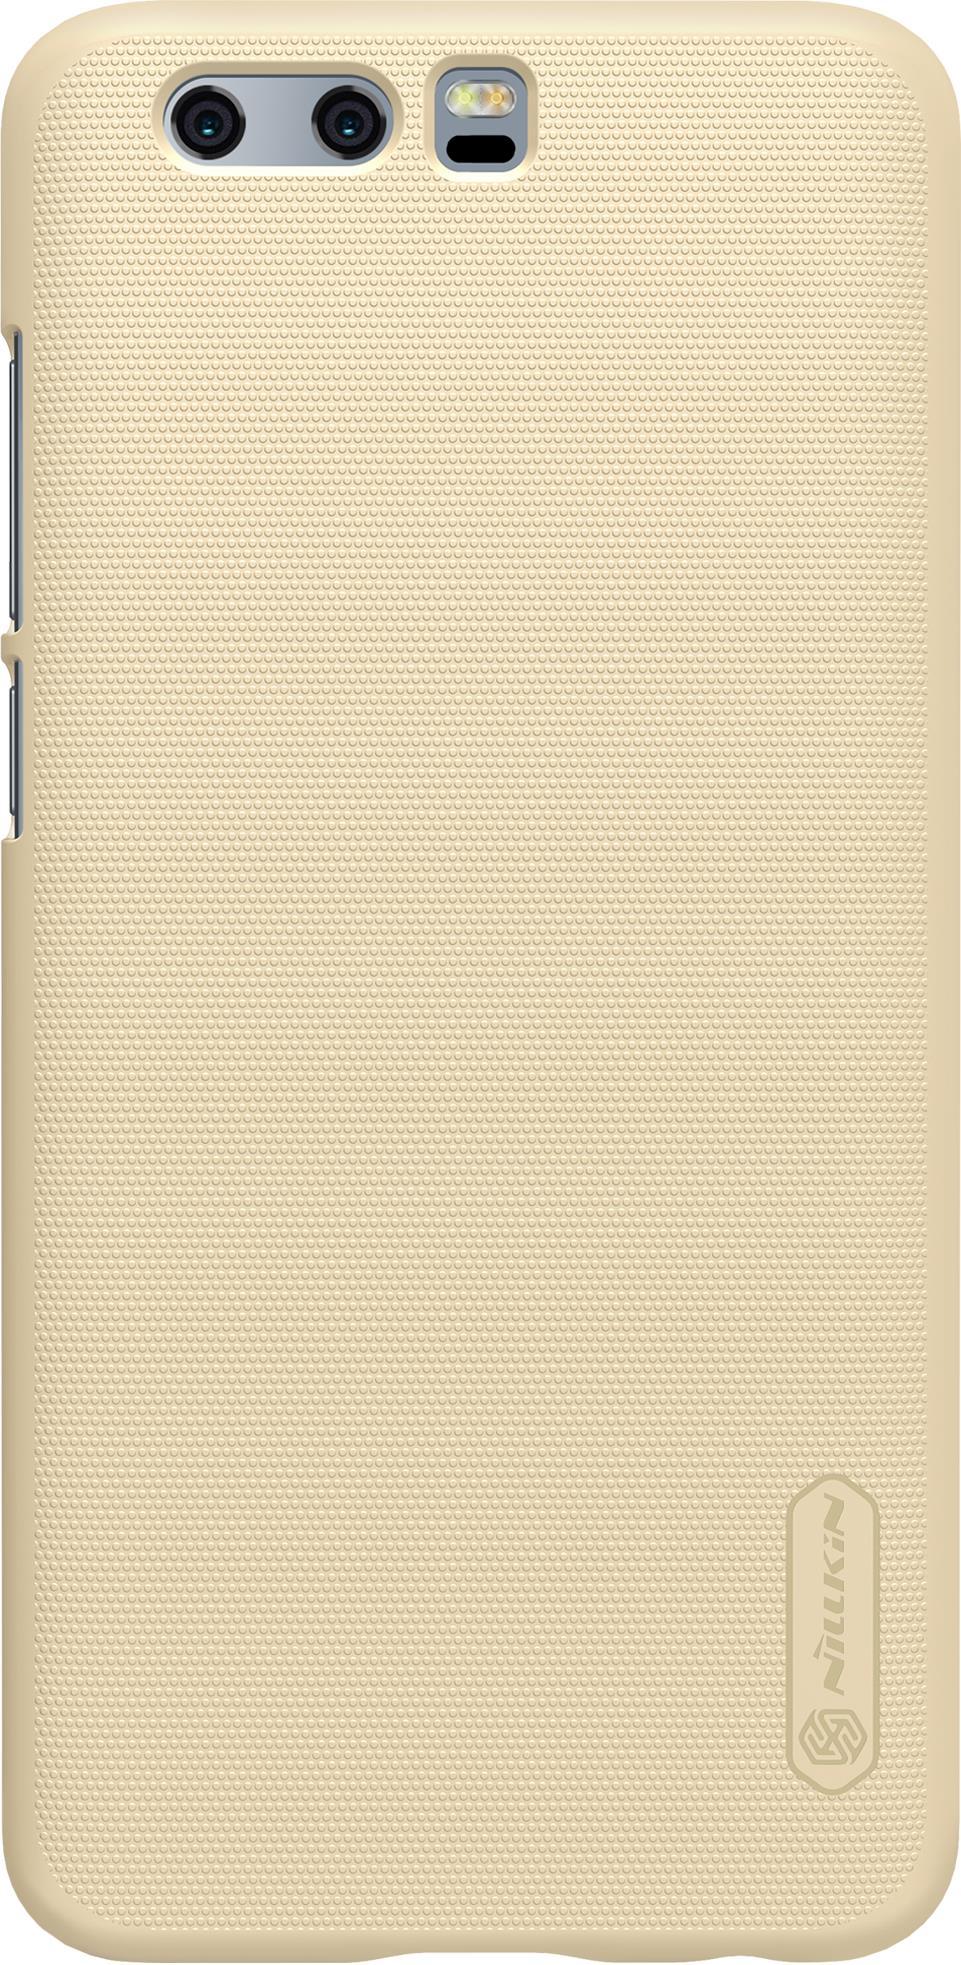 Чехол для сотового телефона Nillkin T-N-HH9-002, золотой накладка nillkin super frosted shield для iphone 6 plus цвет белый t n iphone6p 002